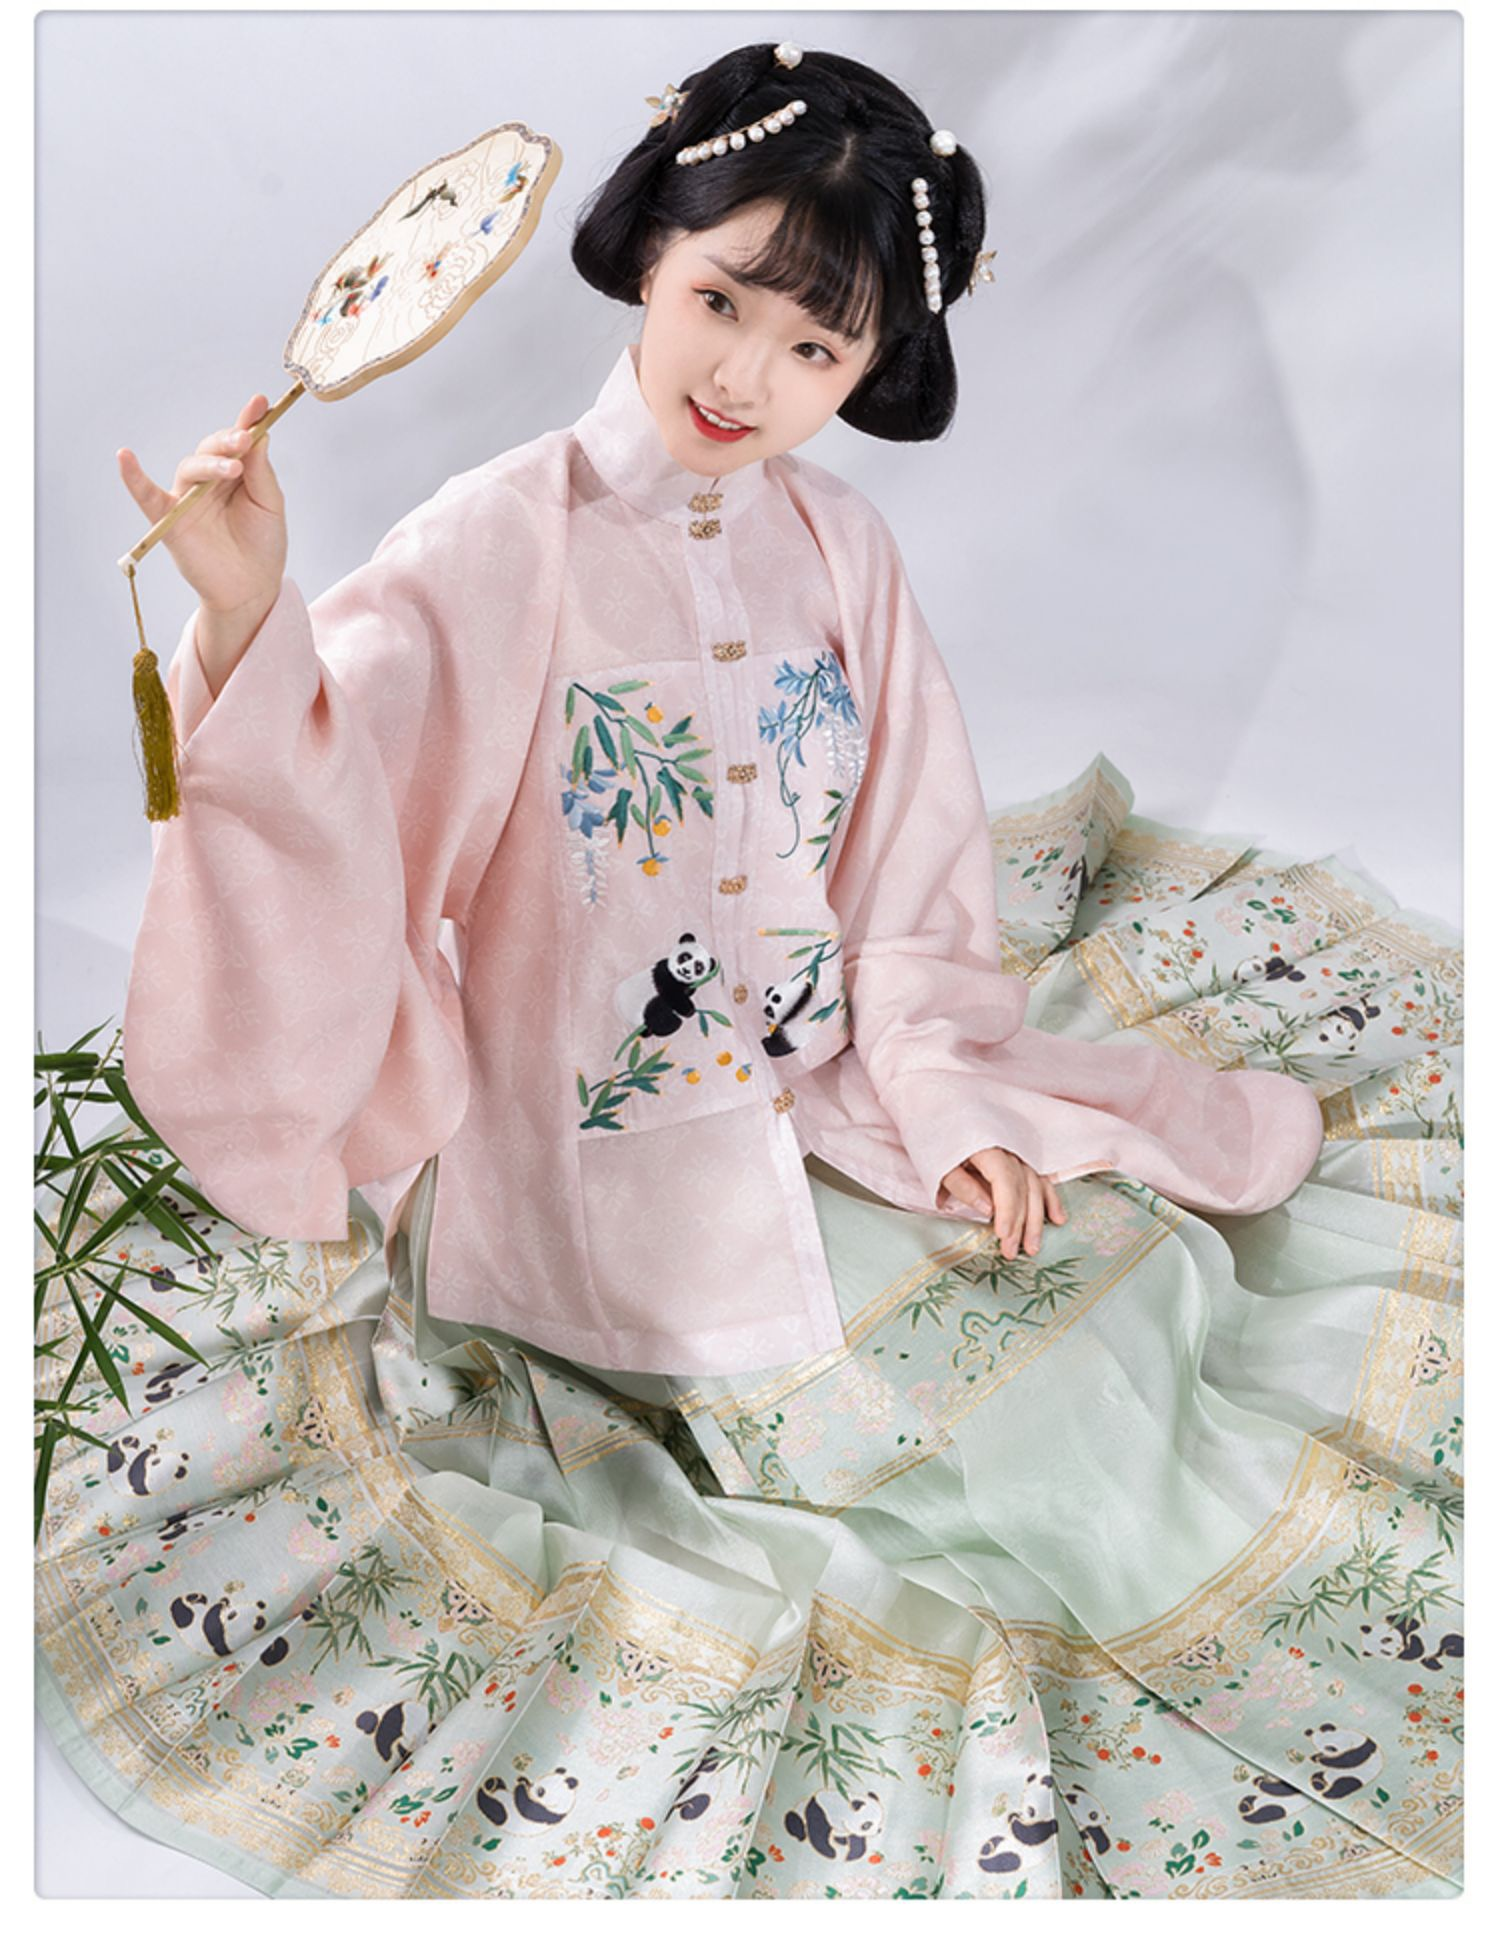 Ming style Hanfu by Chonghui Hantang